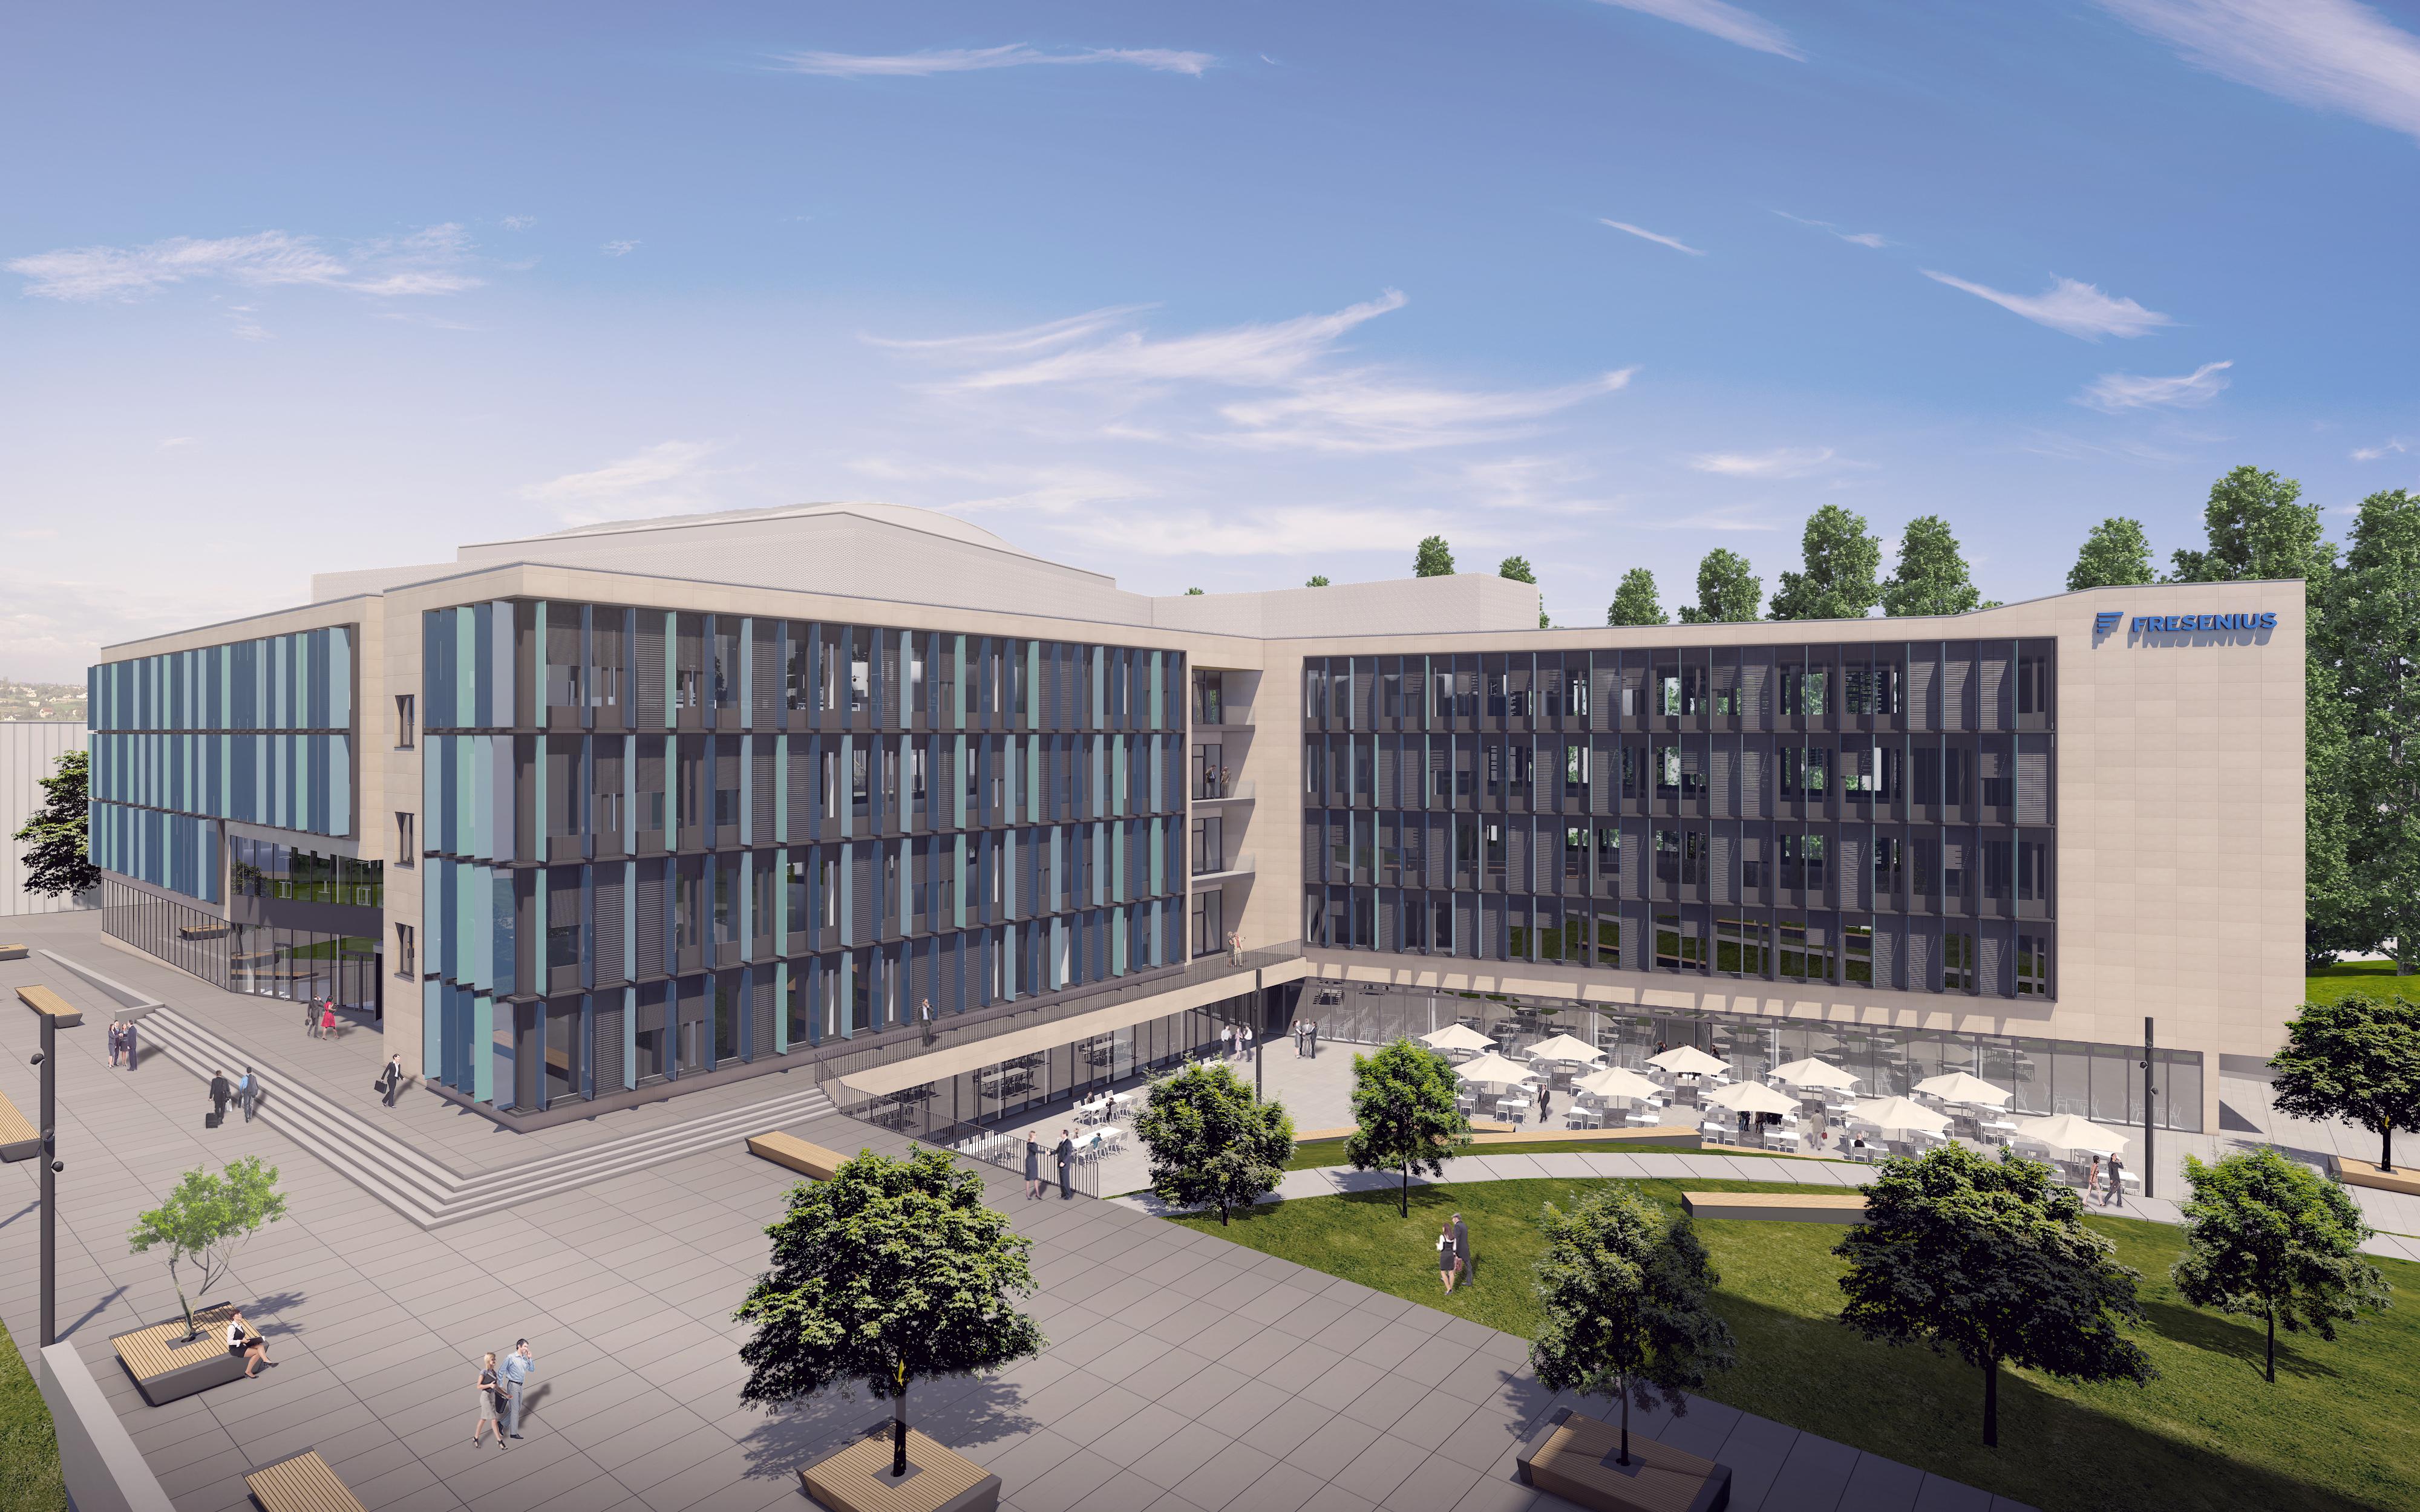 Neubau Bürogebäude mit Kantine und Tiefgarage EK3, Bad Homburg